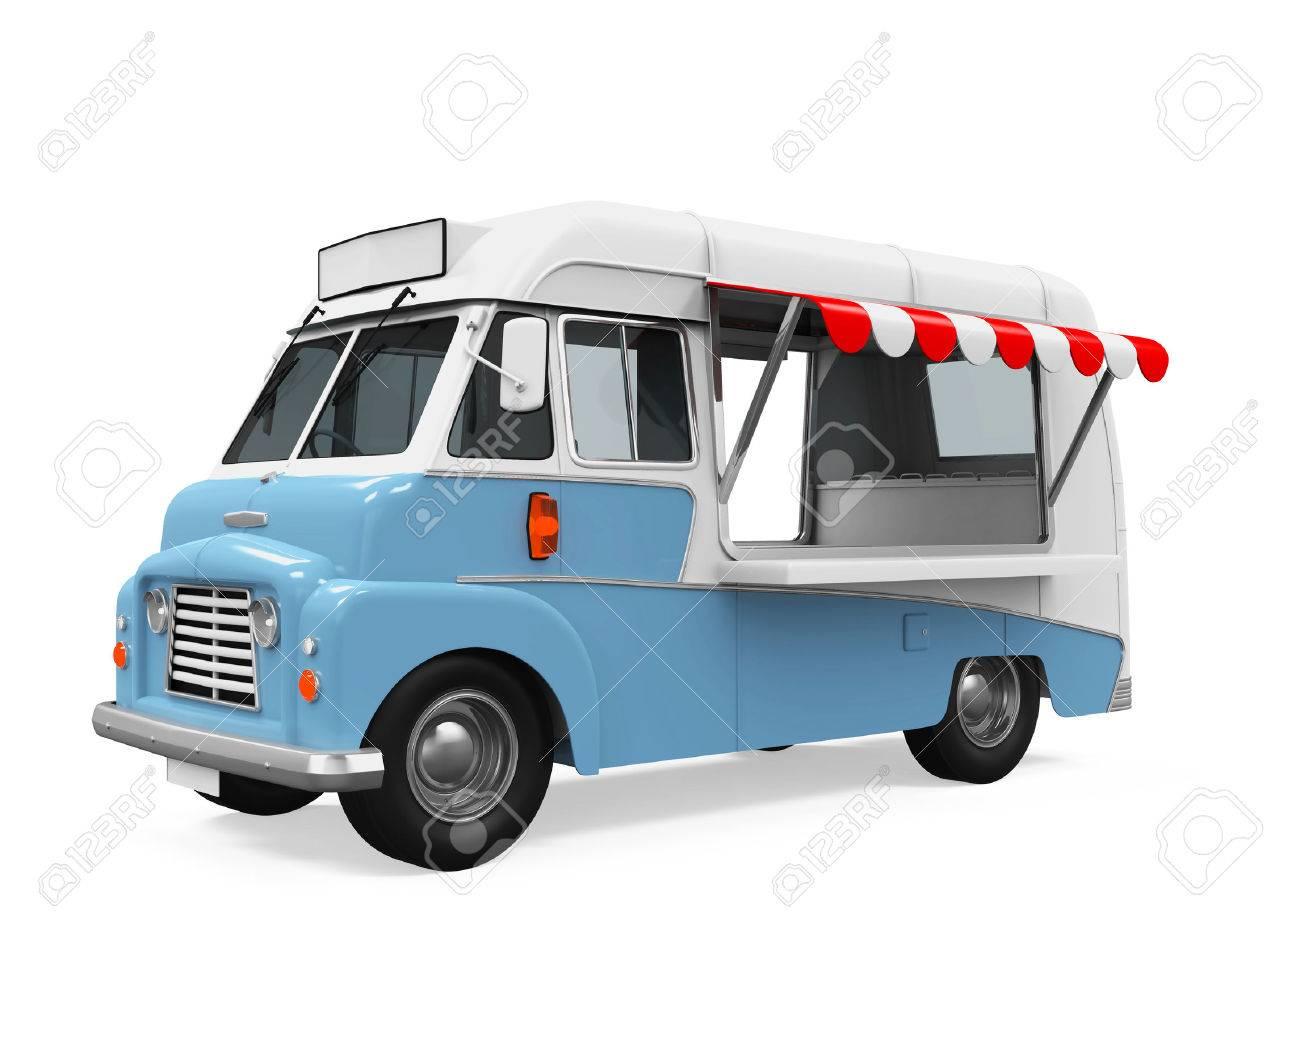 Food Truck - 67258069